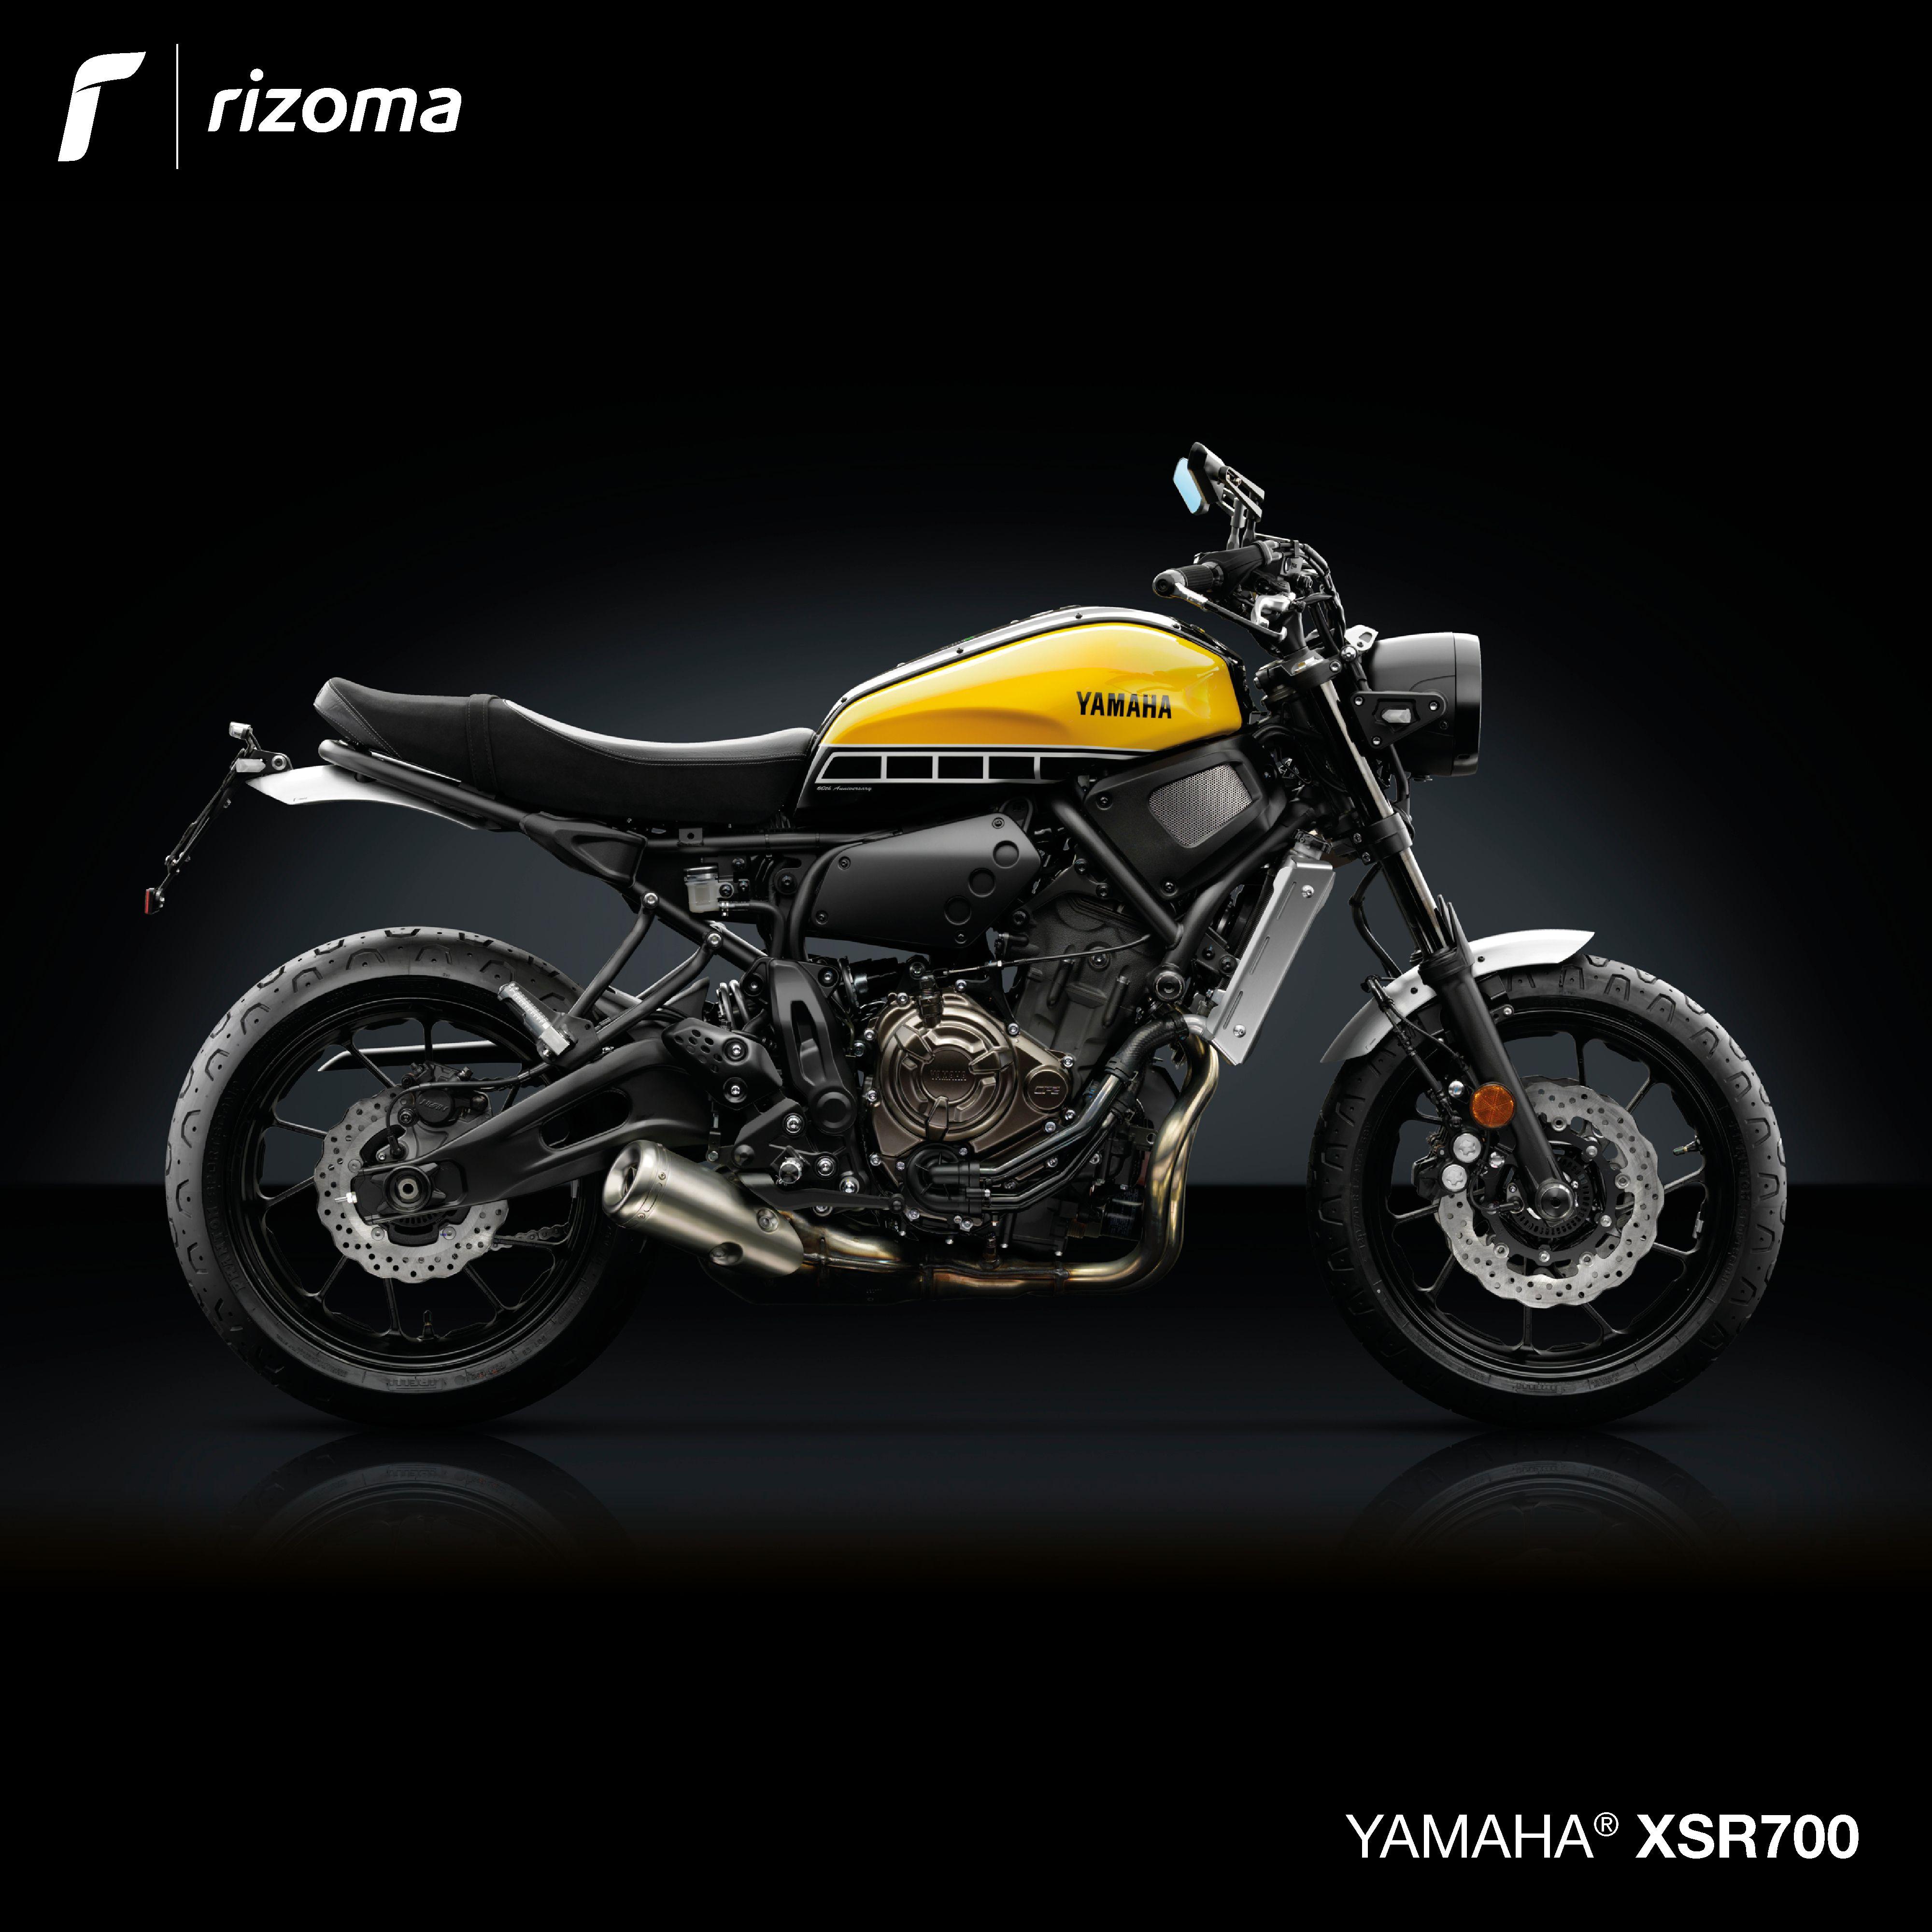 Awesome Get Up On The Yamaha Xsr 700 Follow Cafesofinsta Cafe Racer Bikes Cafe Racer Motorcycle Yamaha Bikes